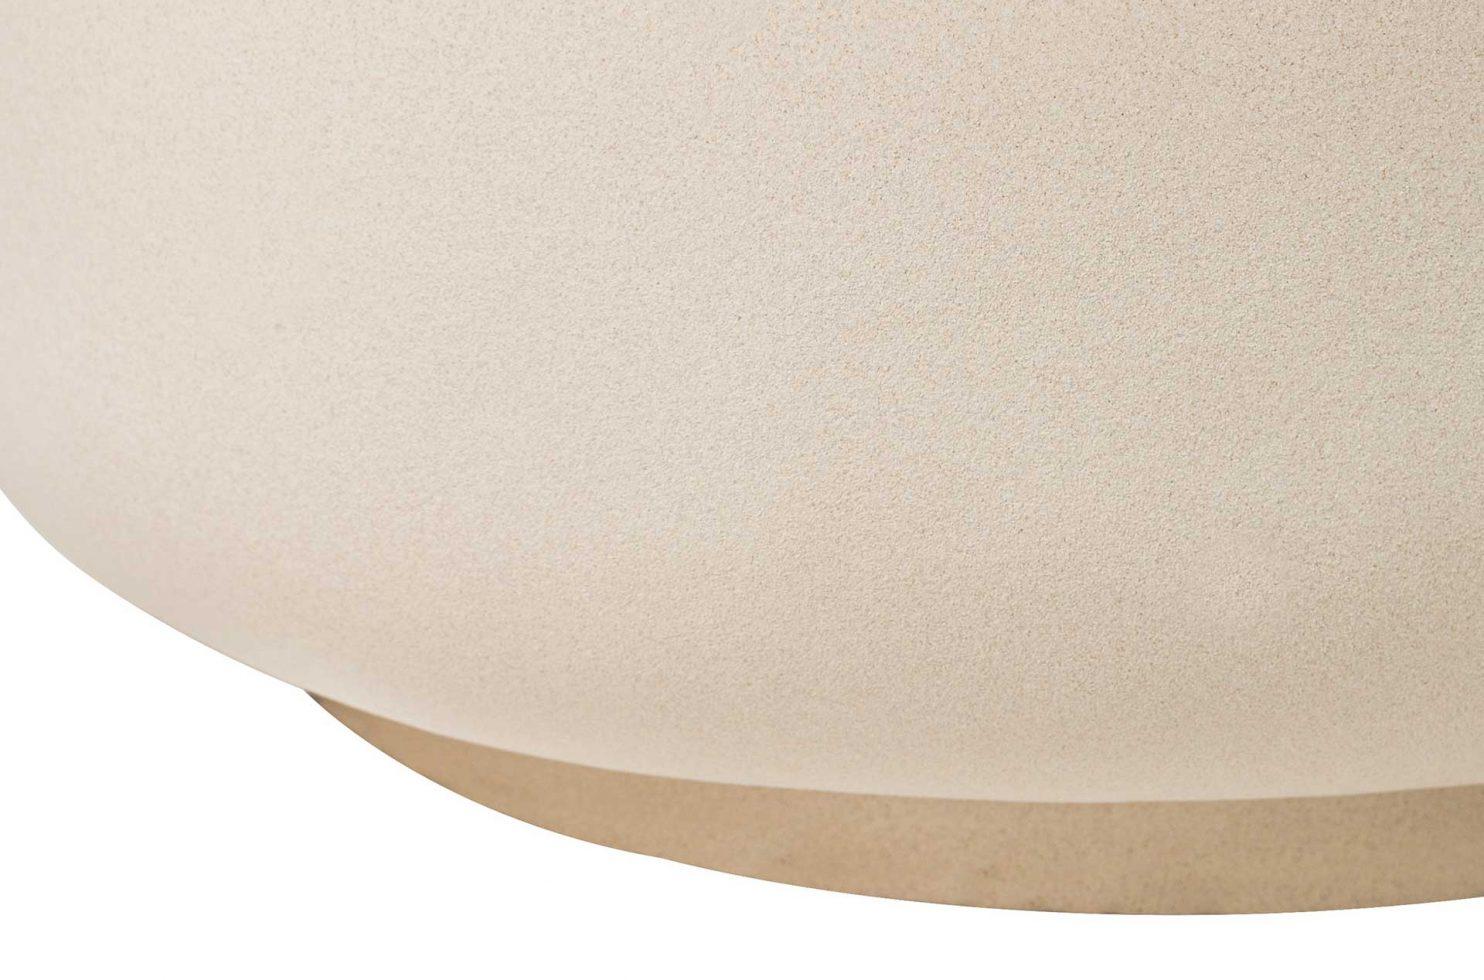 prov cer serenity side table 20in C3080153435 linen sand dtl2 web